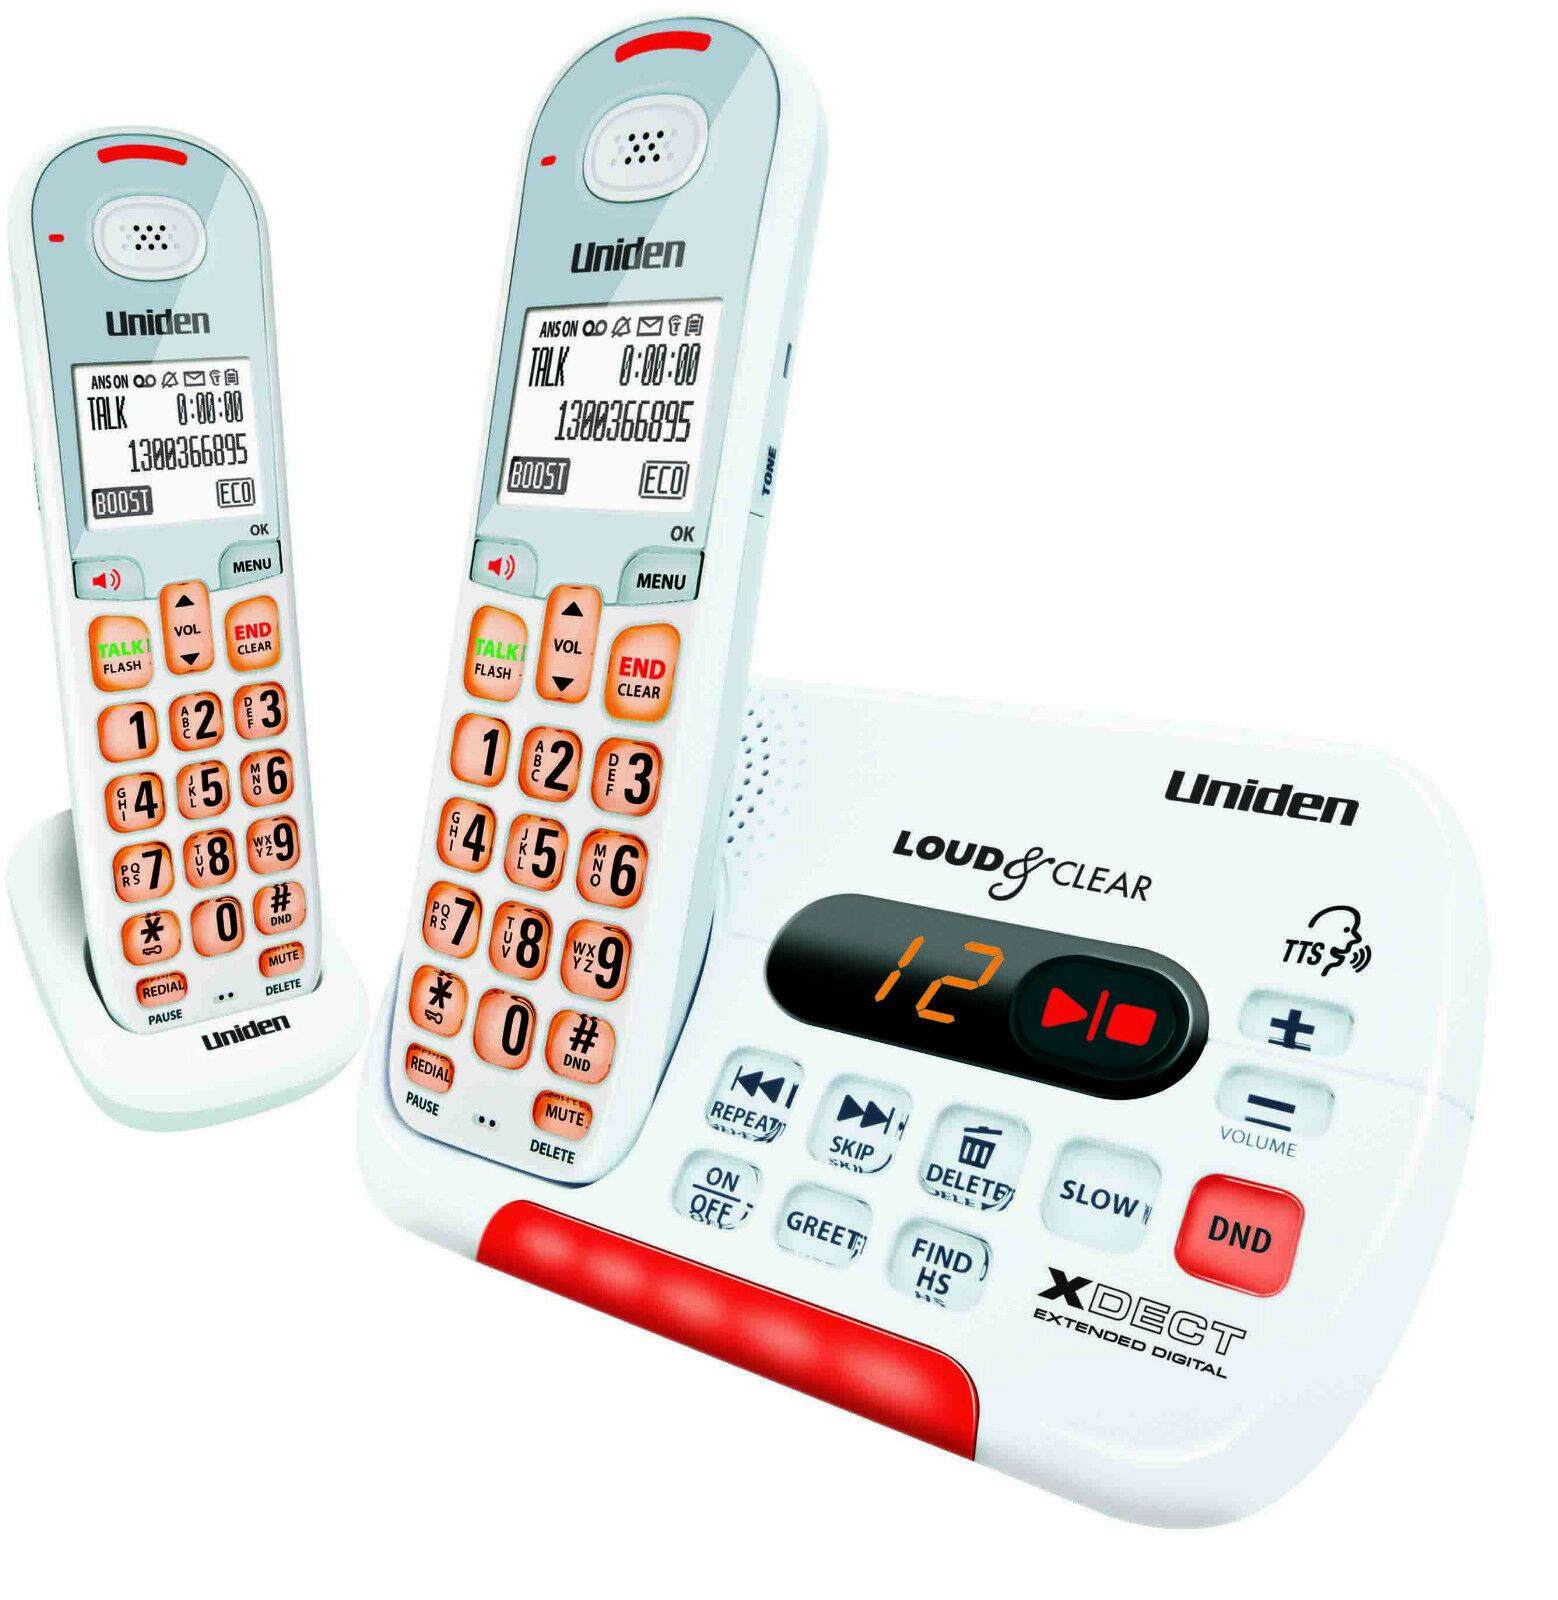 UNIDEN SSE-35+1 DIGITAL CORDLESS PHONE IDEAL 4 HEARING